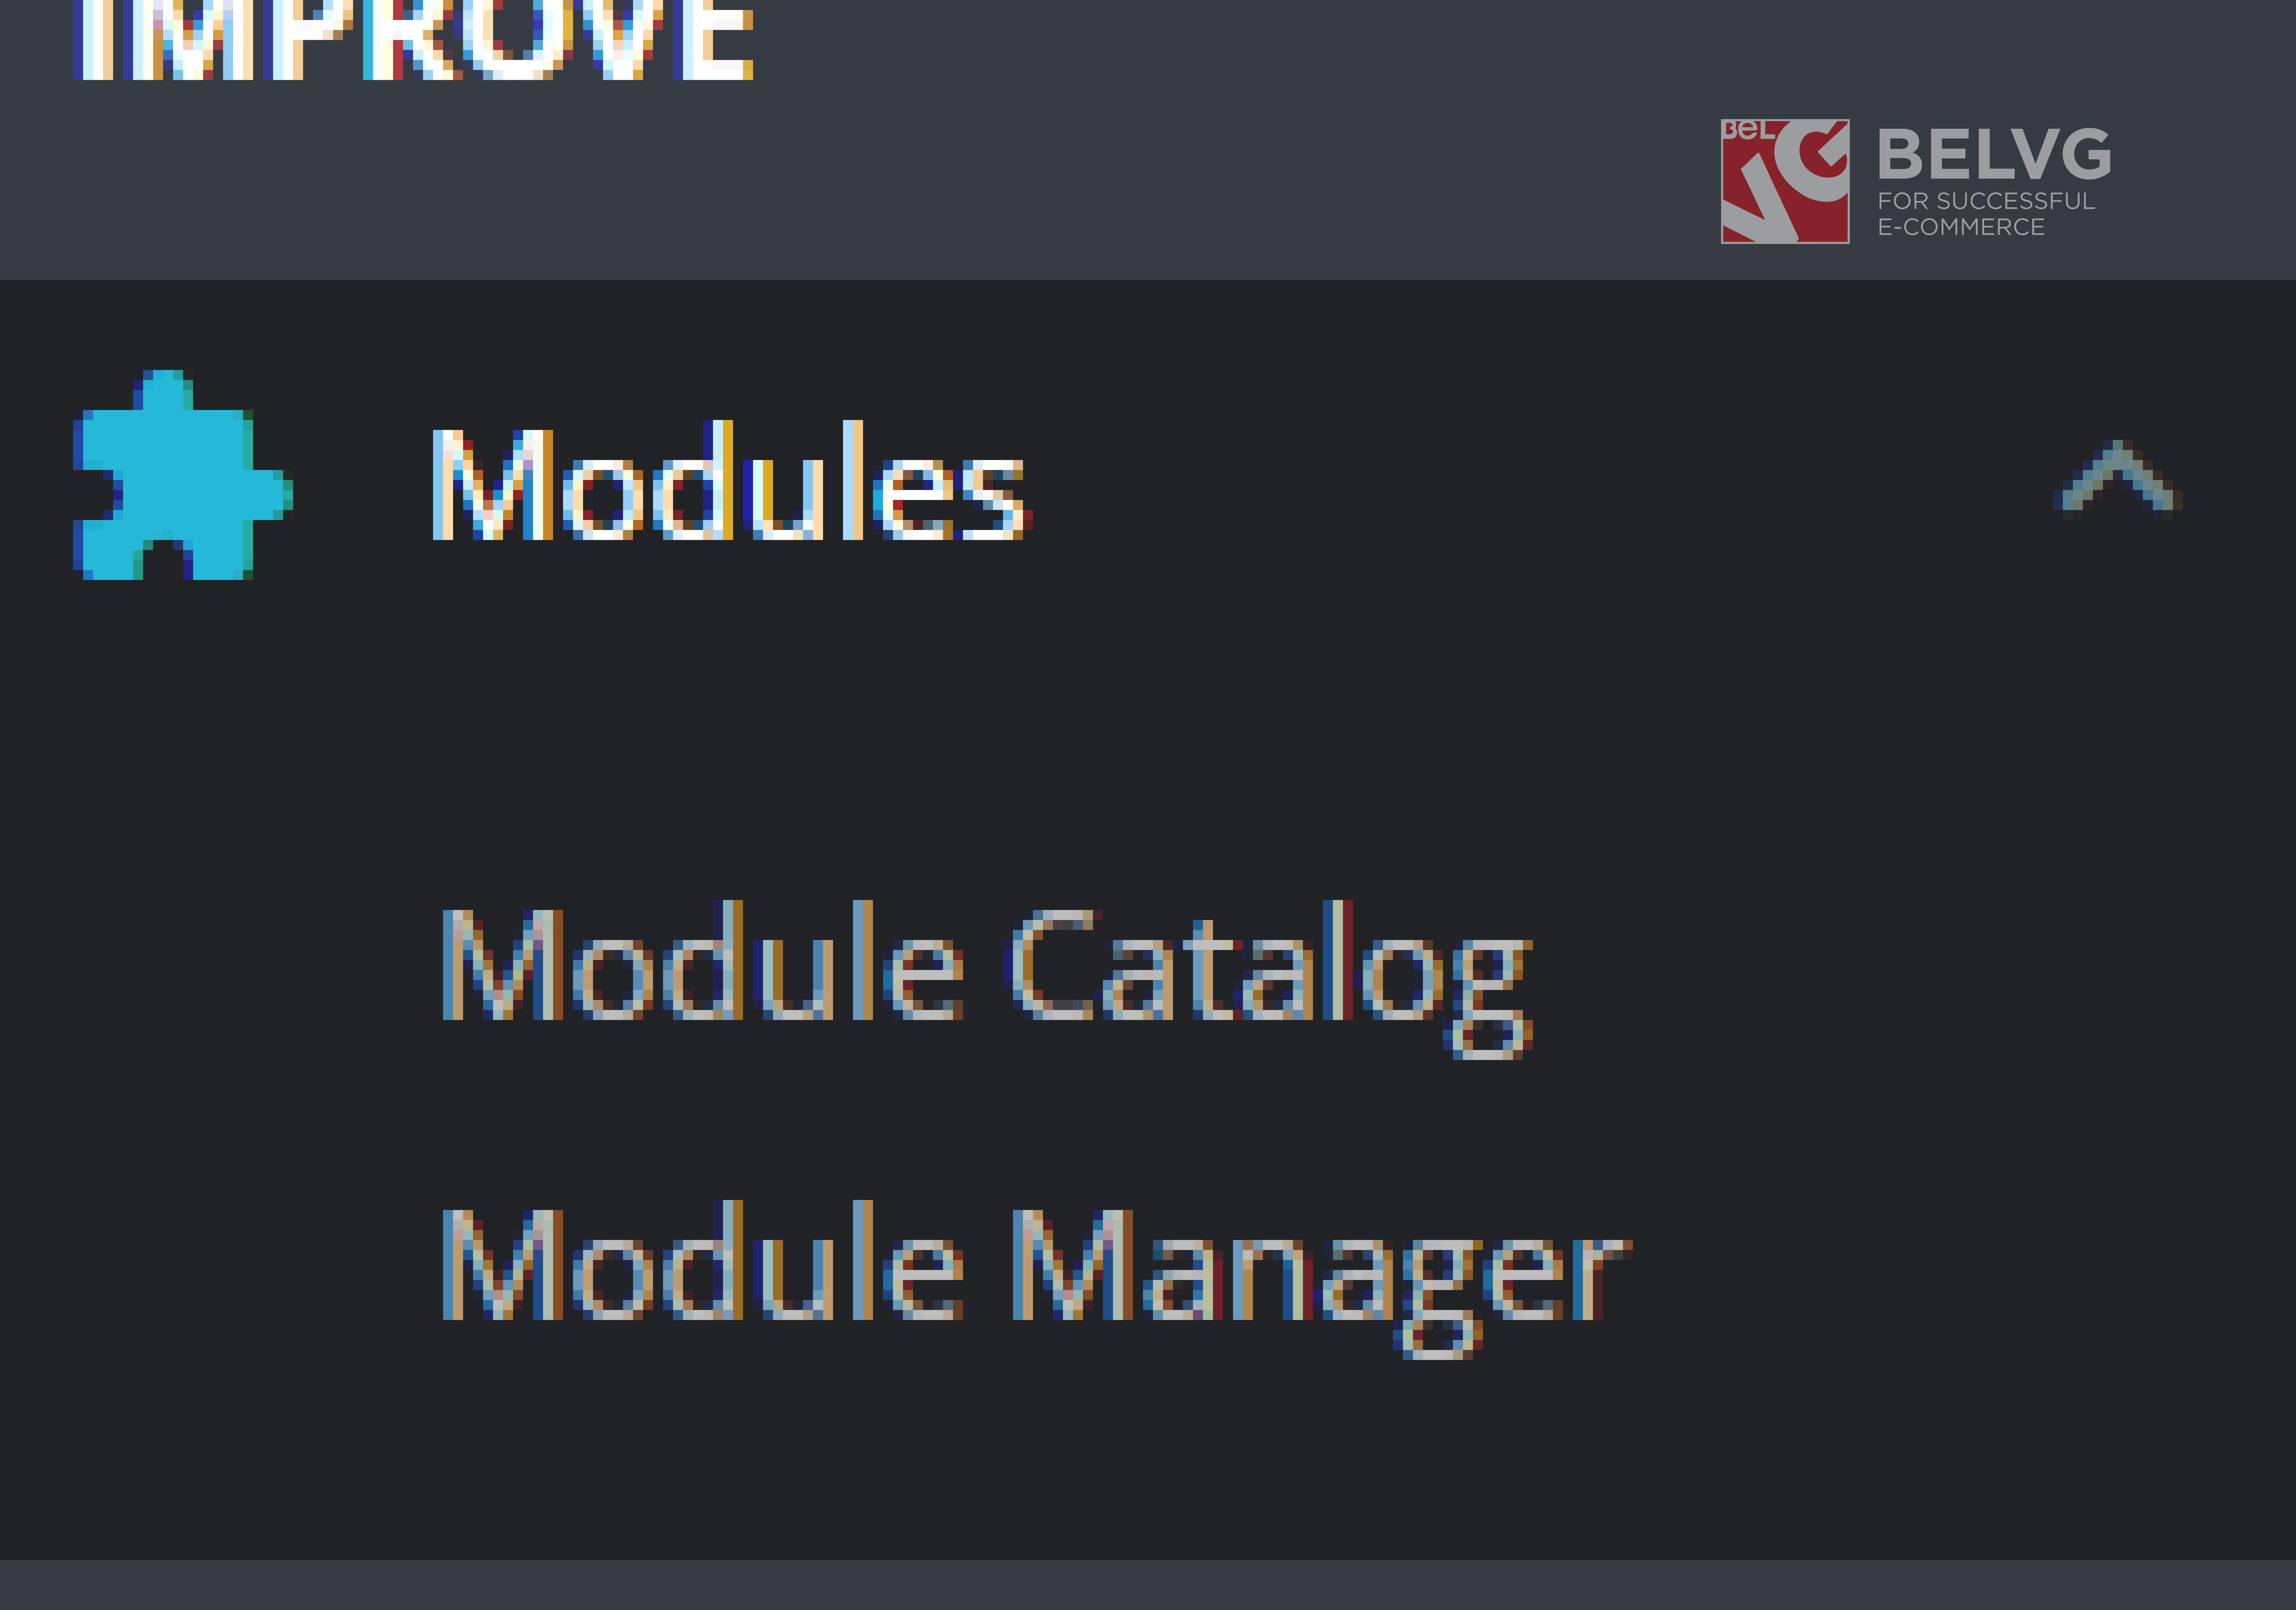 module catalog